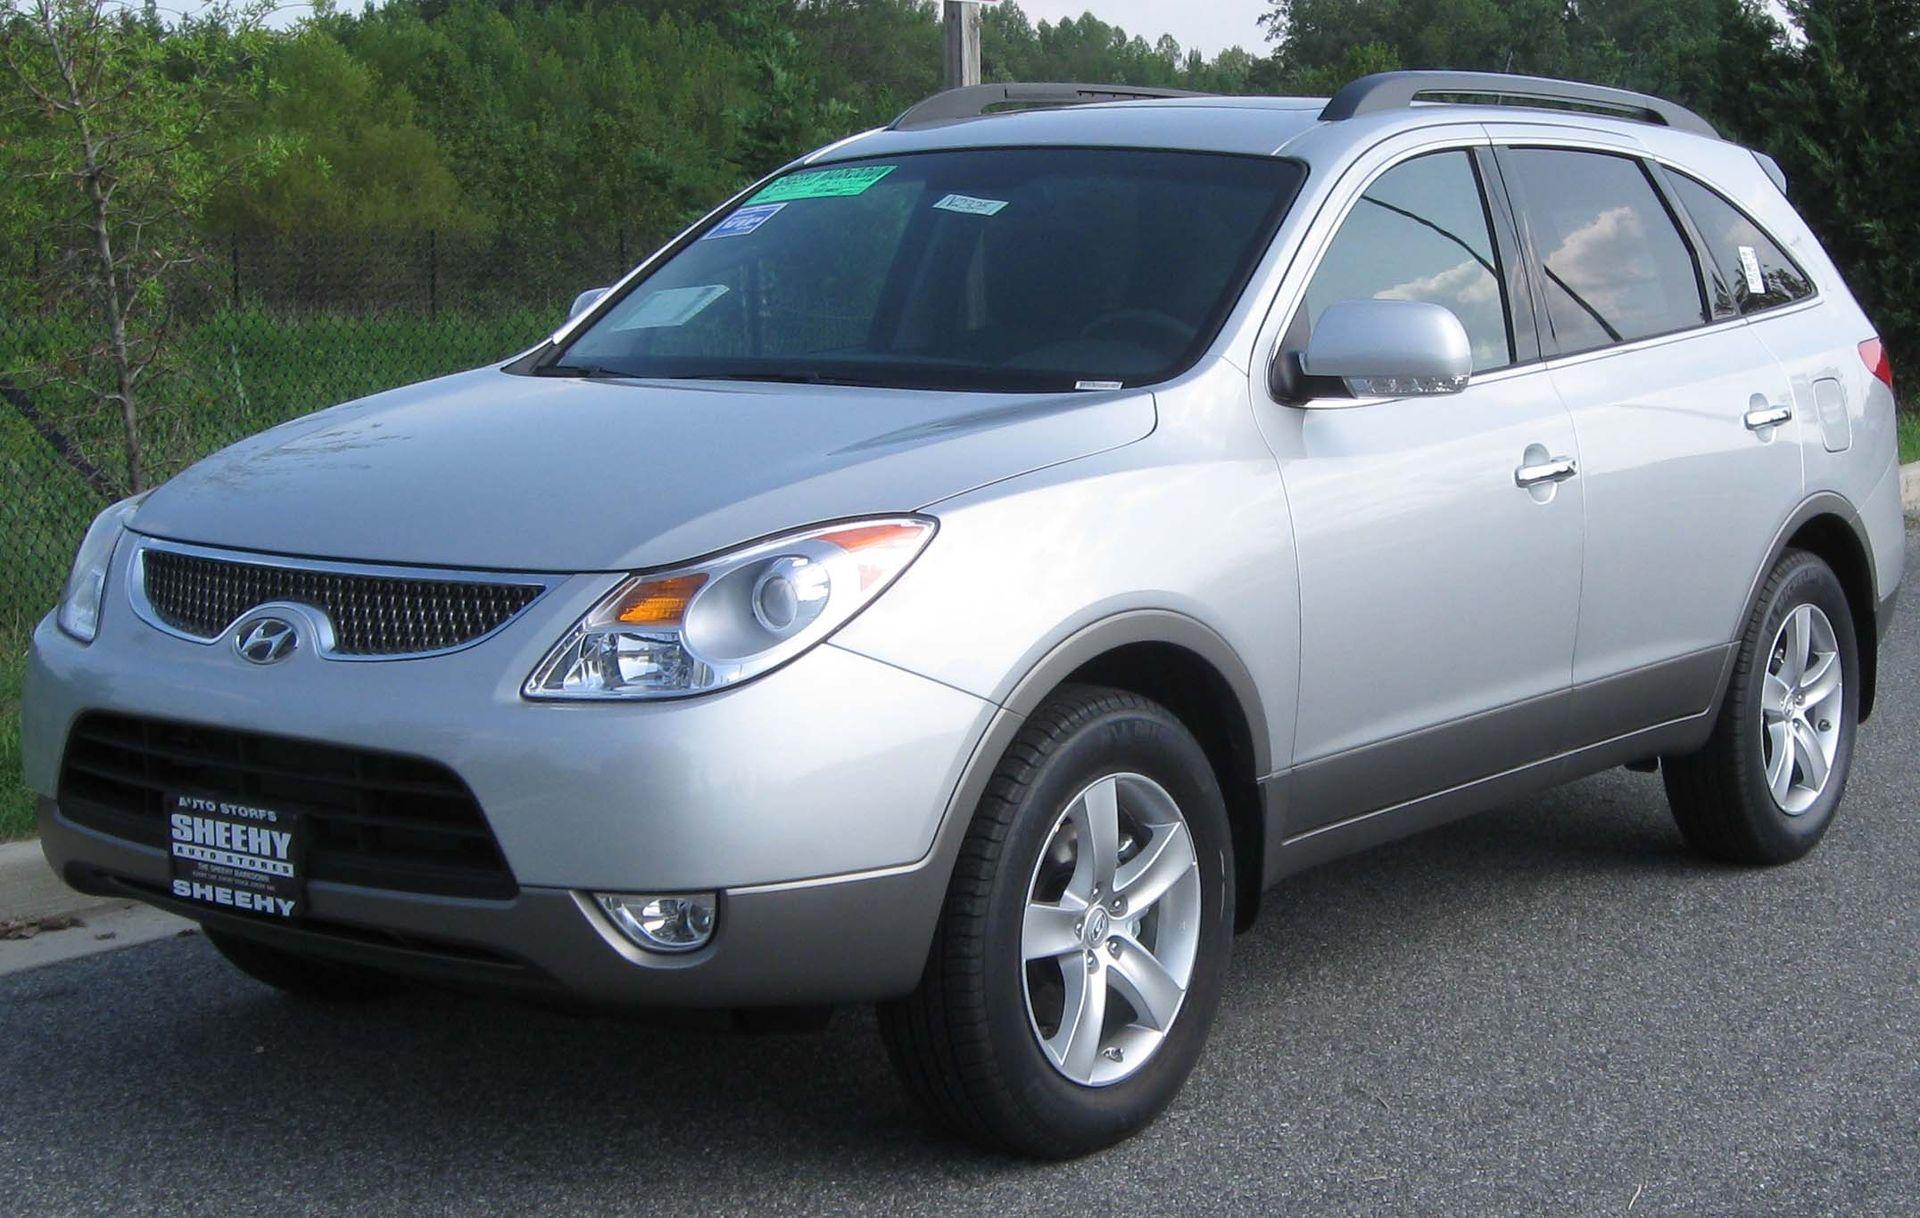 Px Hyundai Veracruz Limited on 2007 Hyundai Veracruz